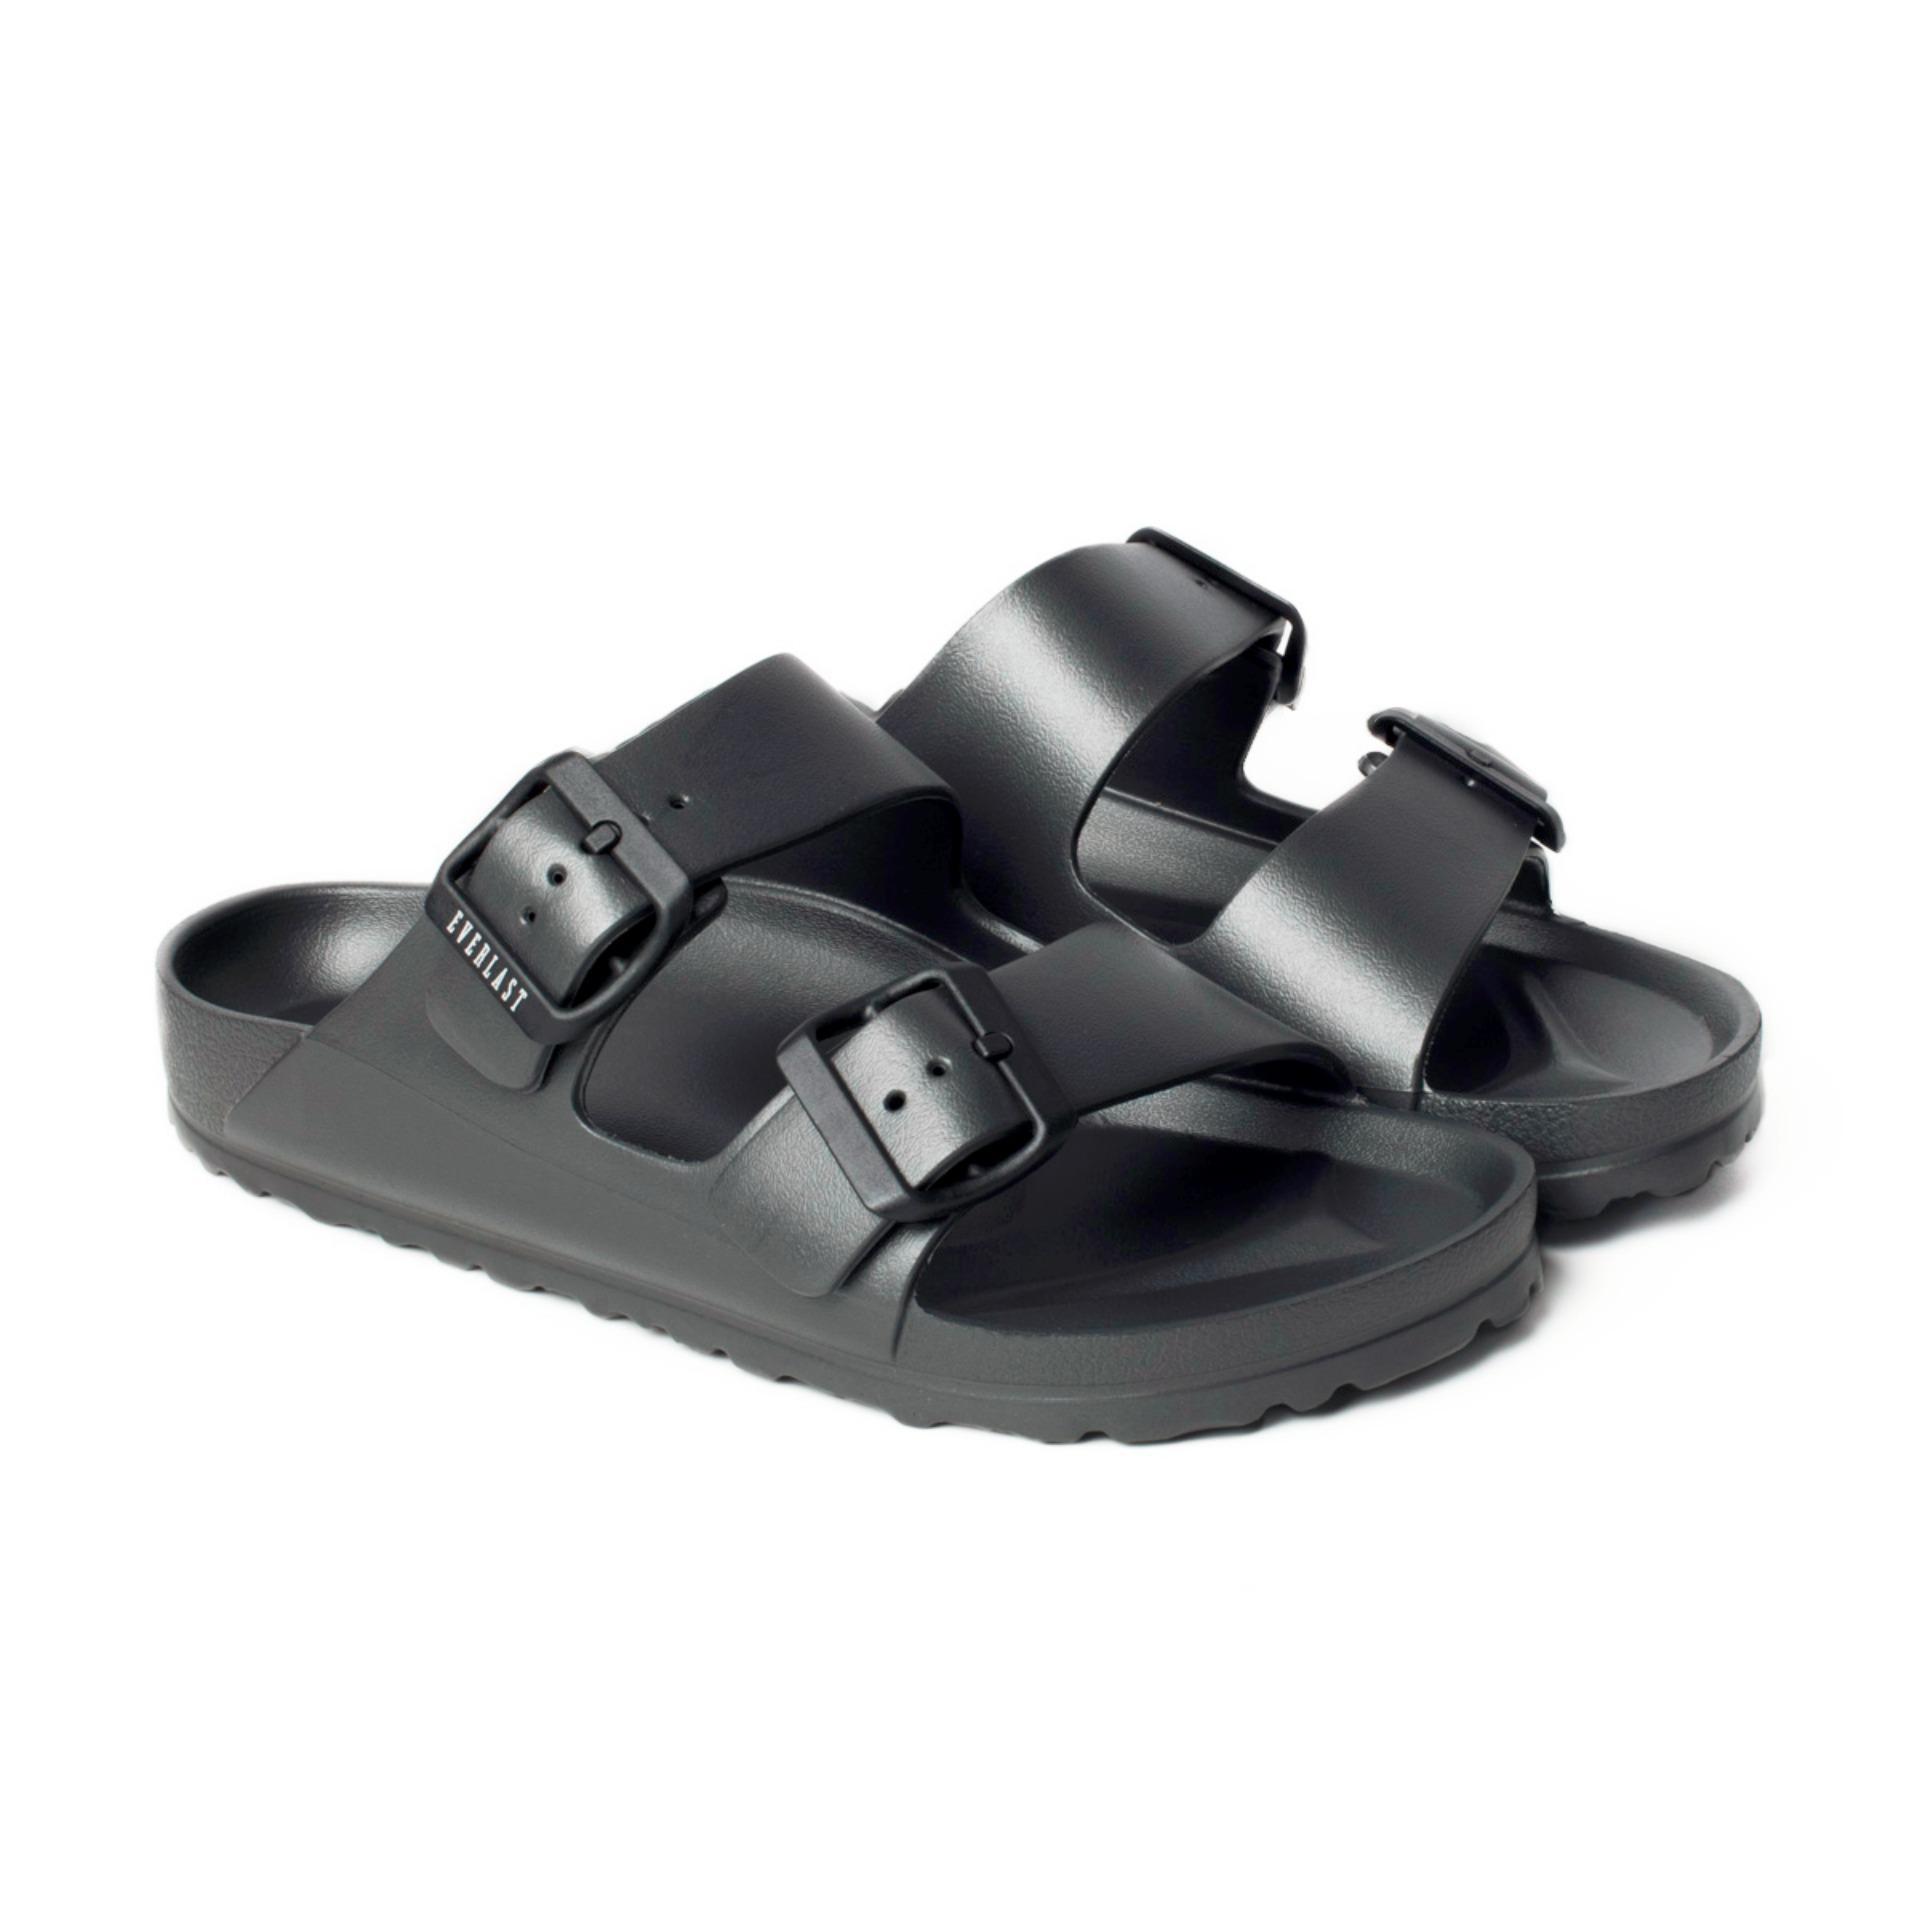 Everlast El17-M527 1ey0005 Mens Sandals (grey) By Everlast Singapore.